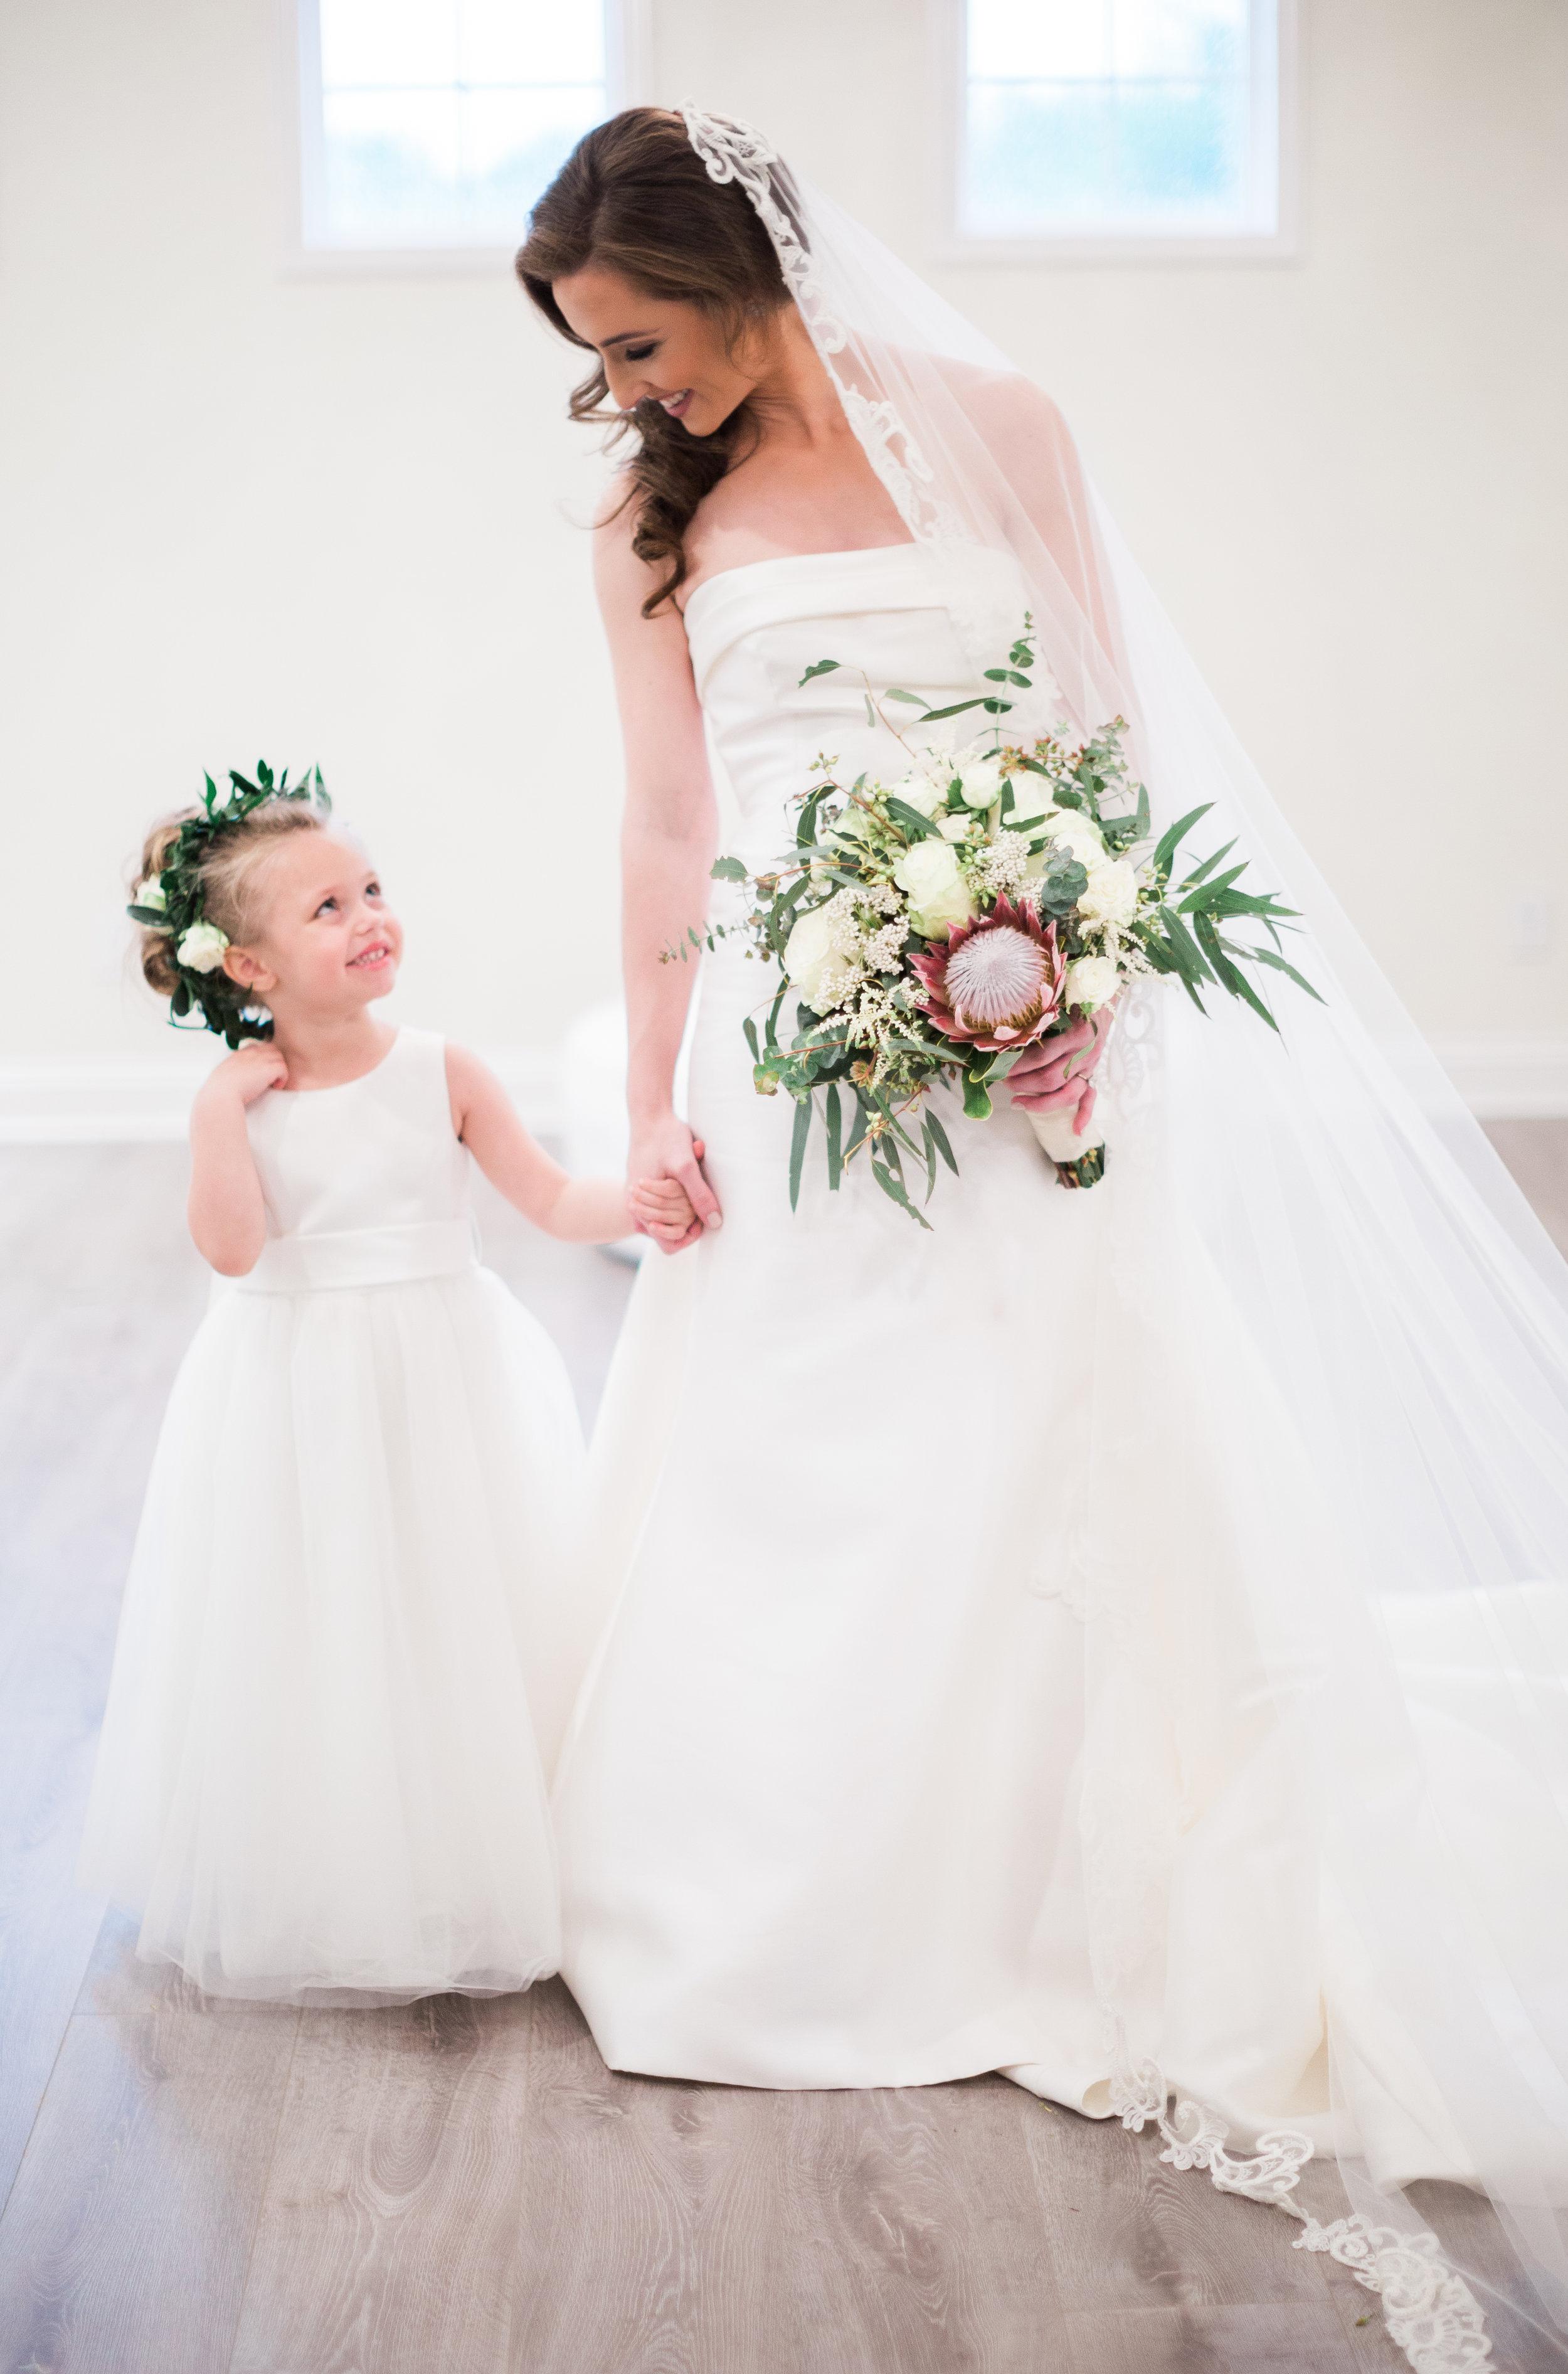 WeddingtonWedding0295.jpg